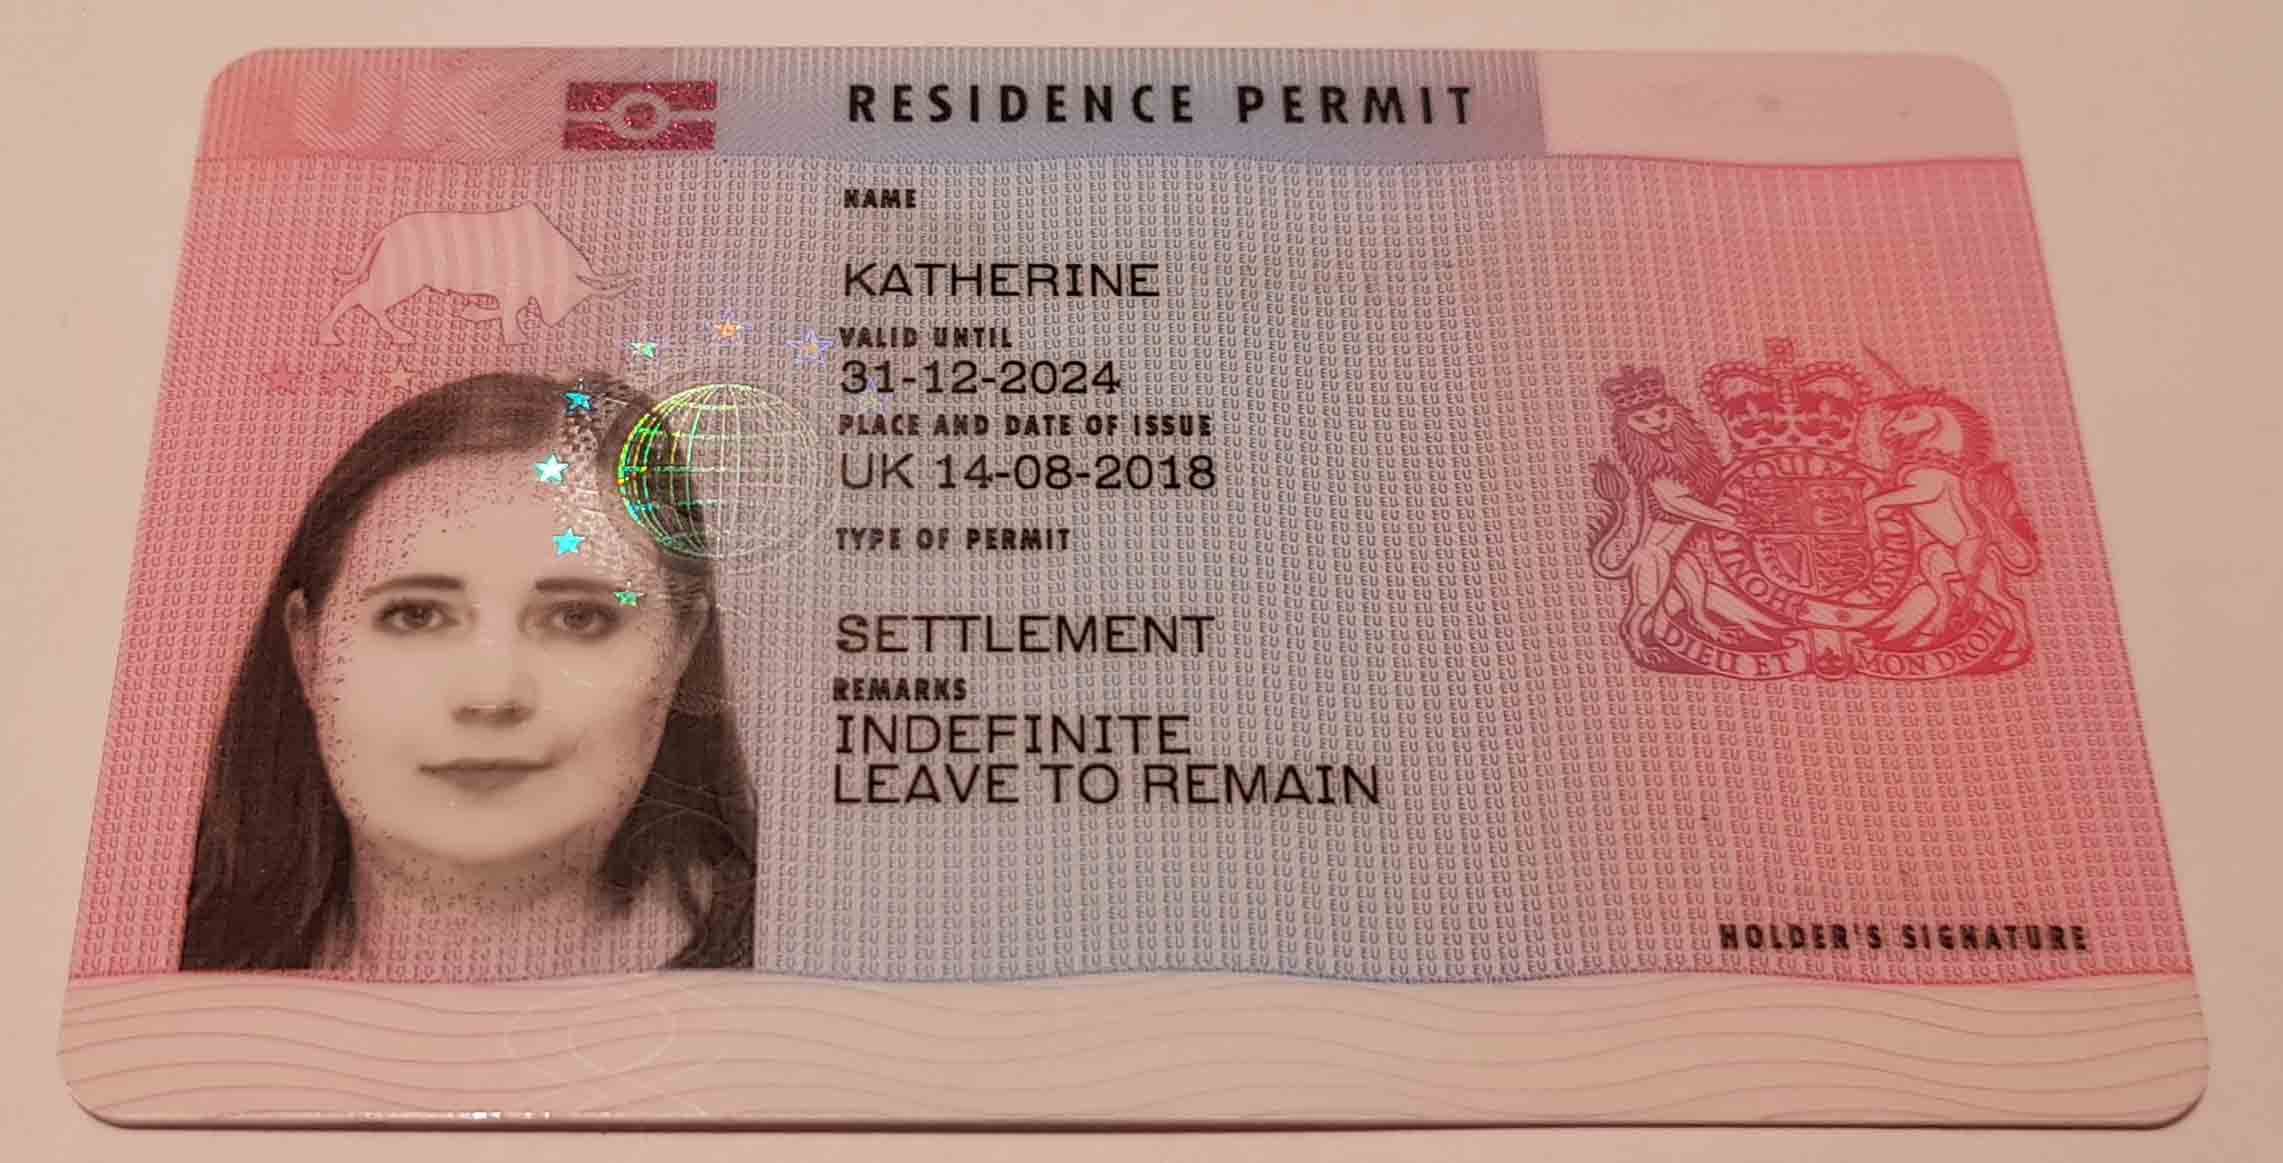 Biometric Residency Permit